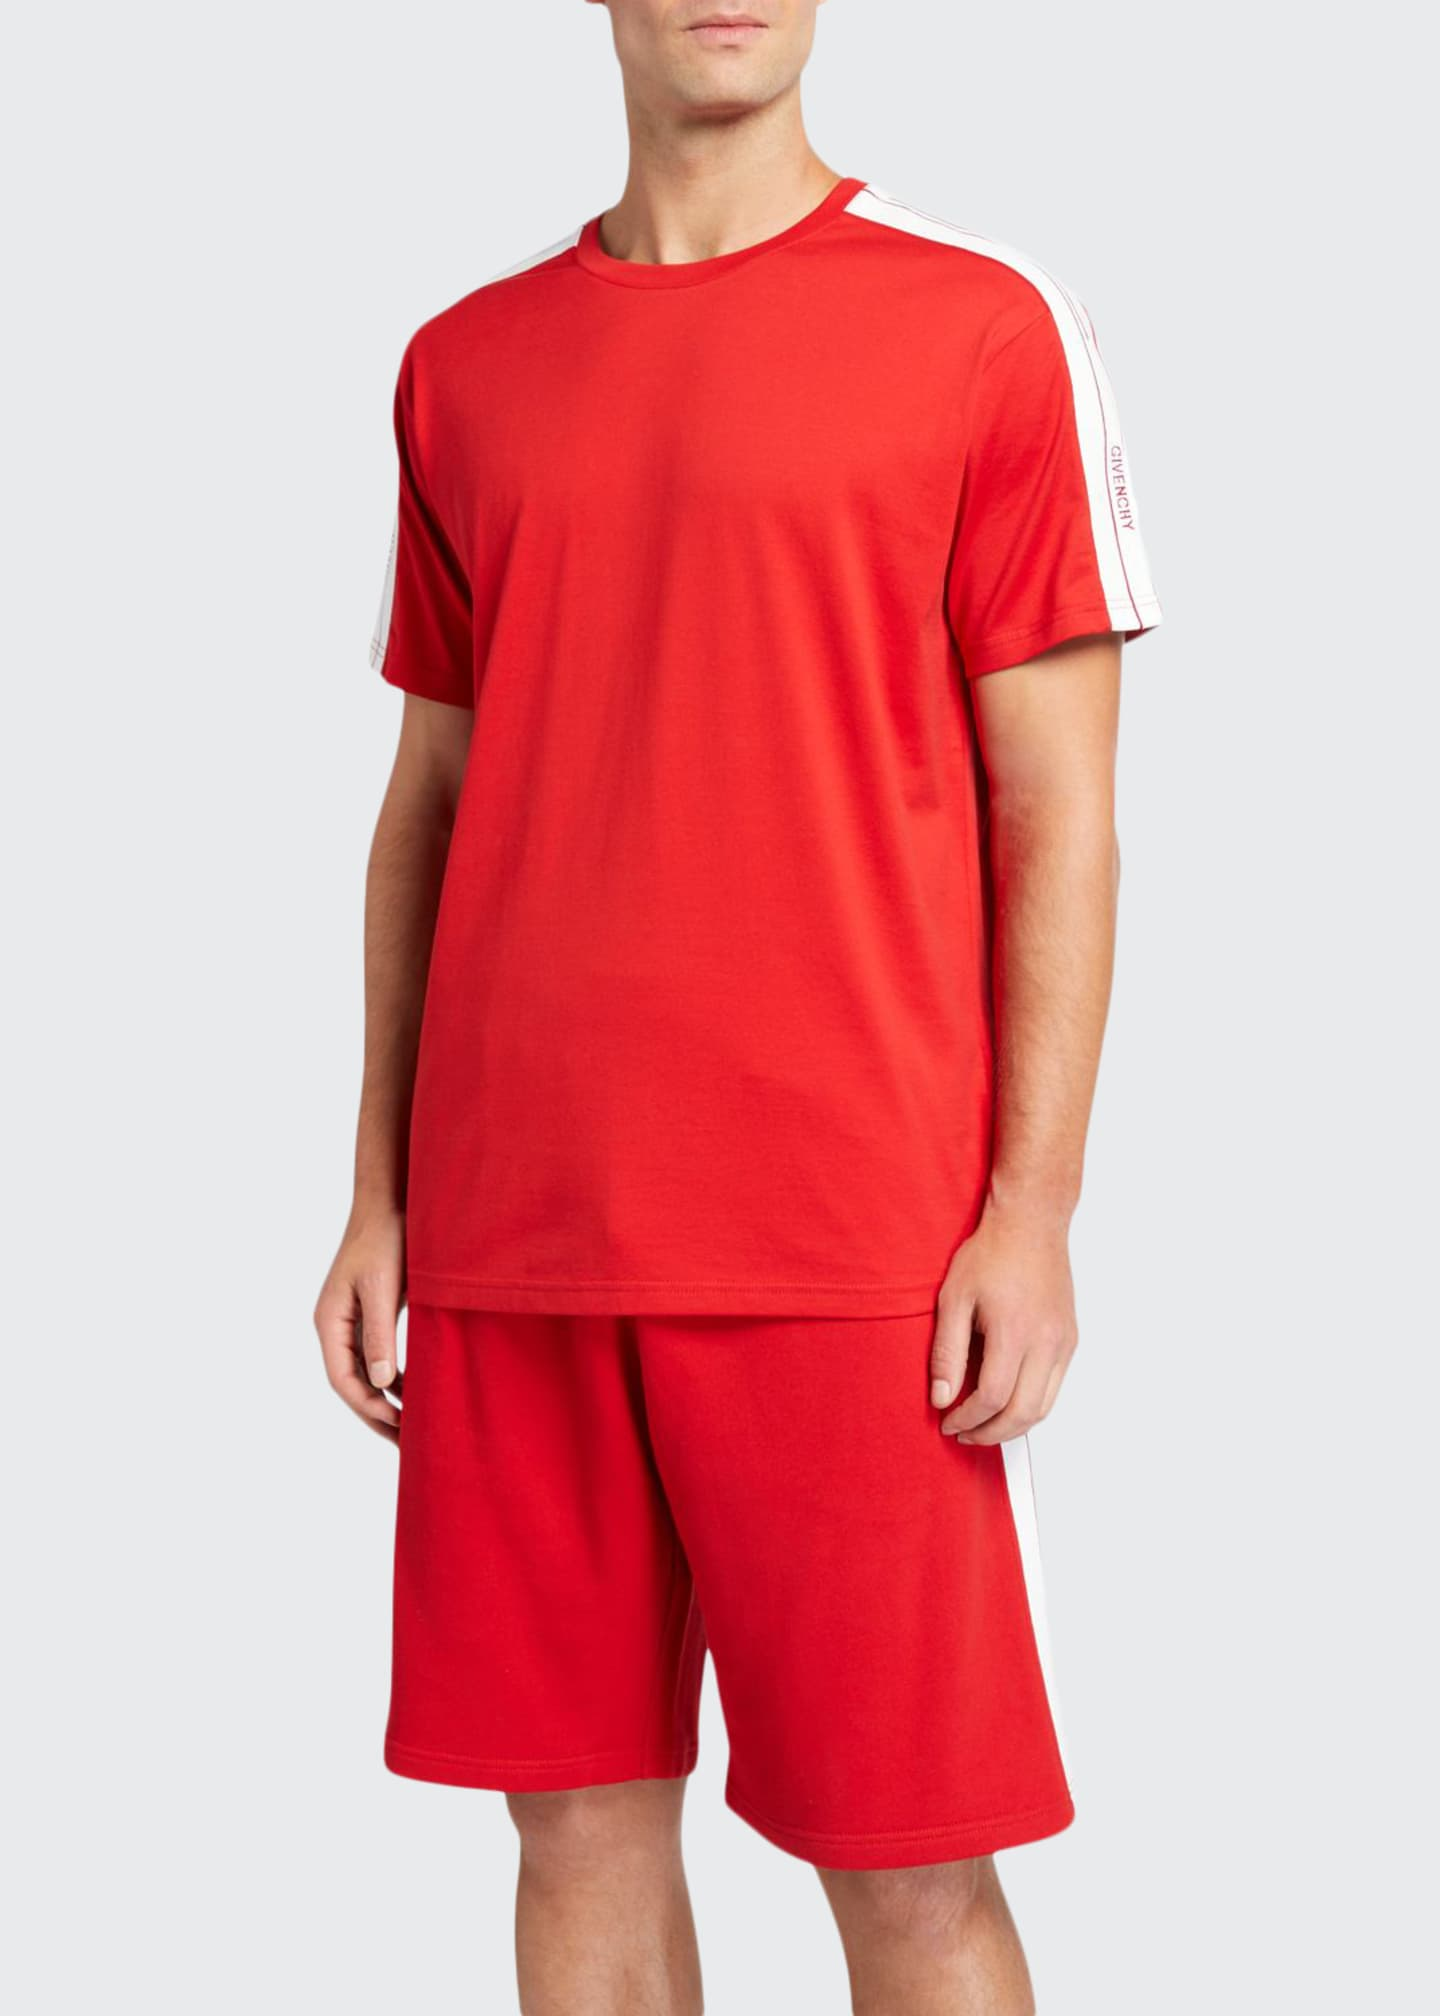 Givenchy Men's Crewneck Logo-Tape T-Shirt